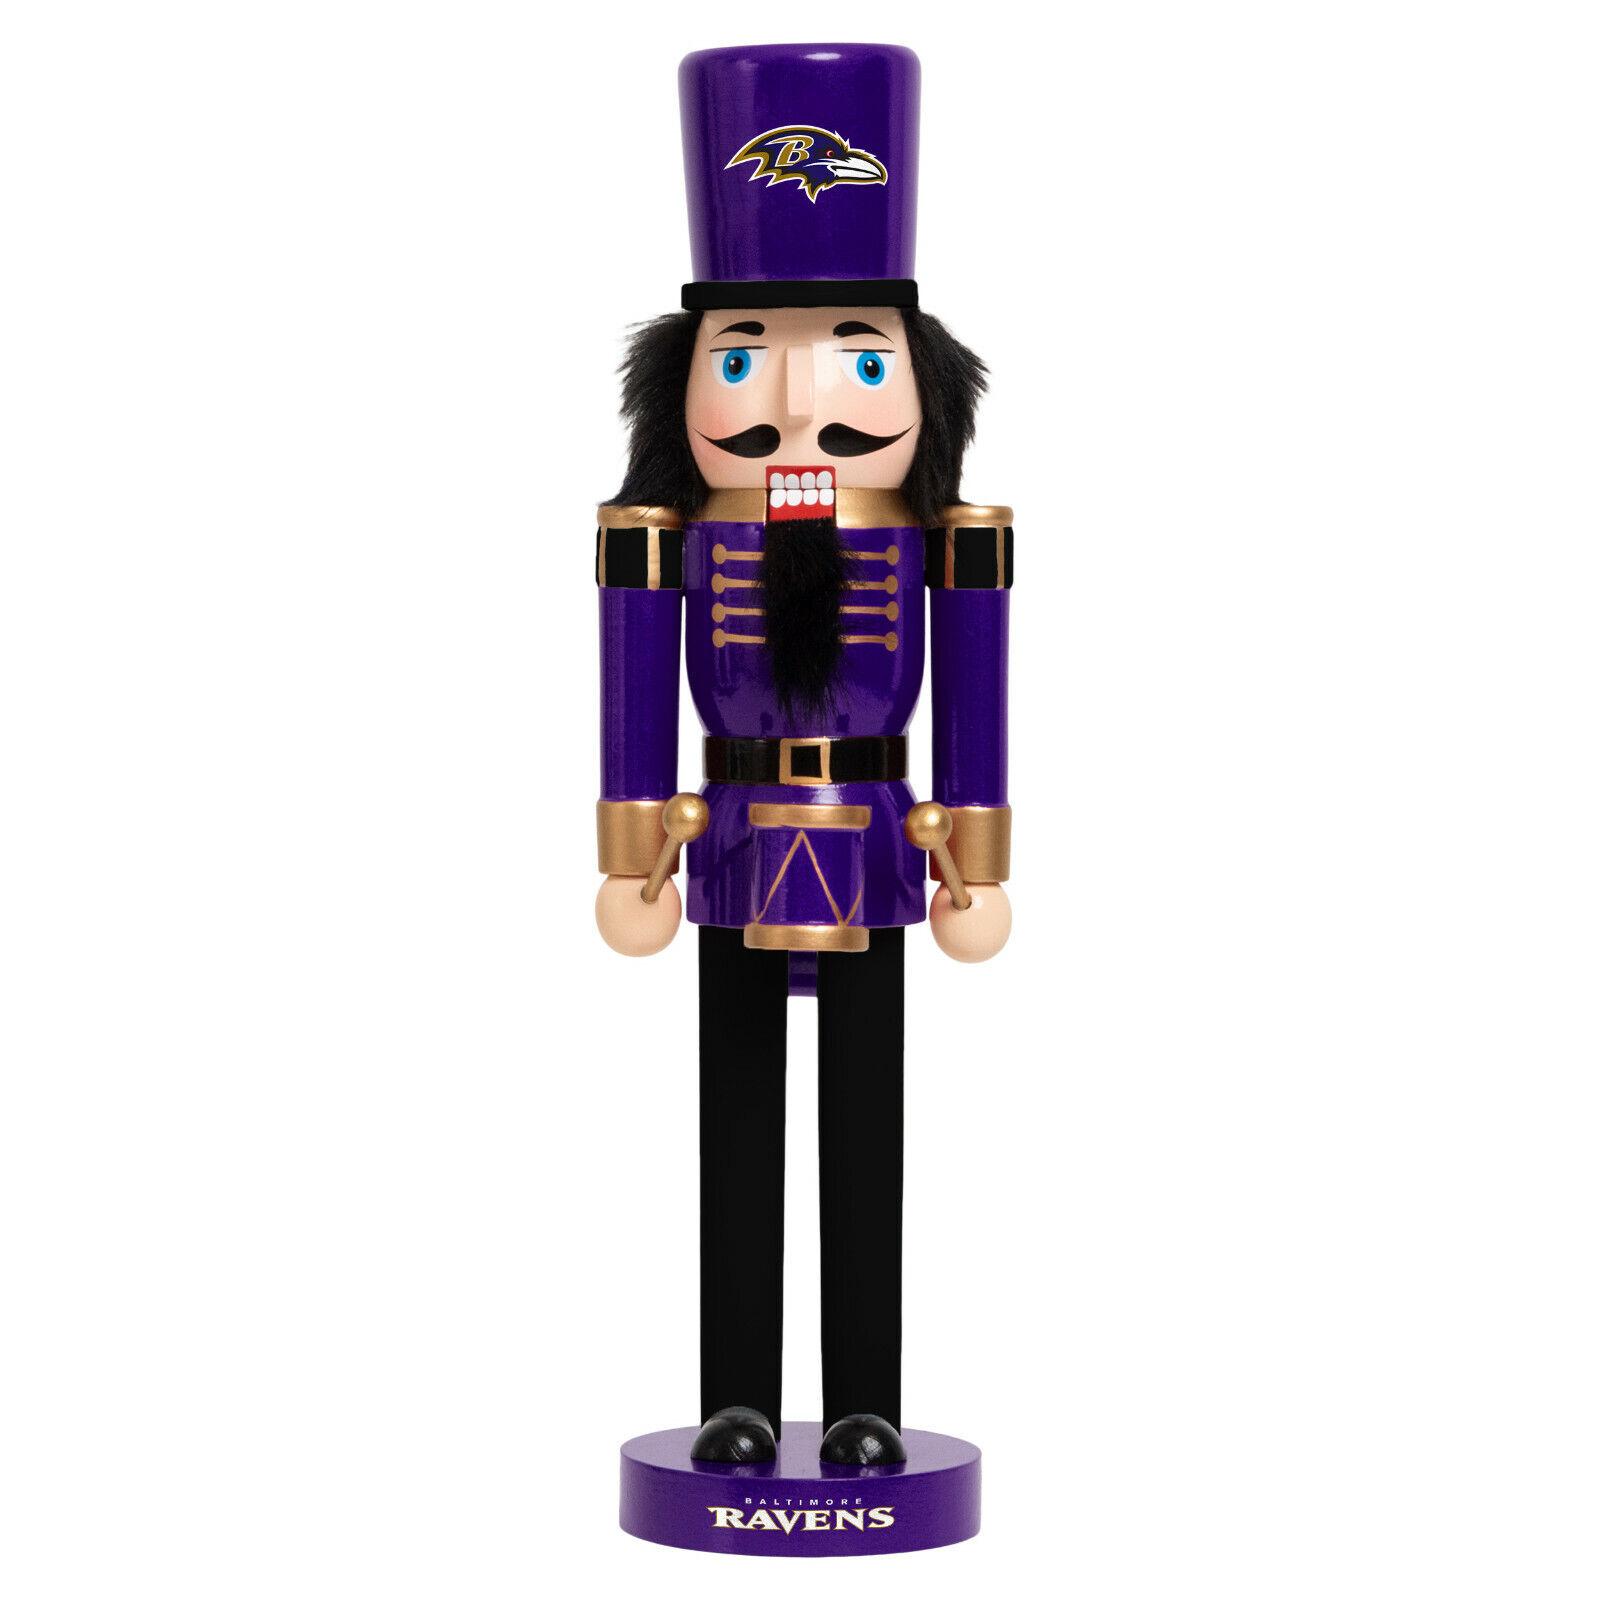 NFL Nußknacker Baltimore Ravens Nutcracker Holiday 2019 Weihnachten Nussknacker